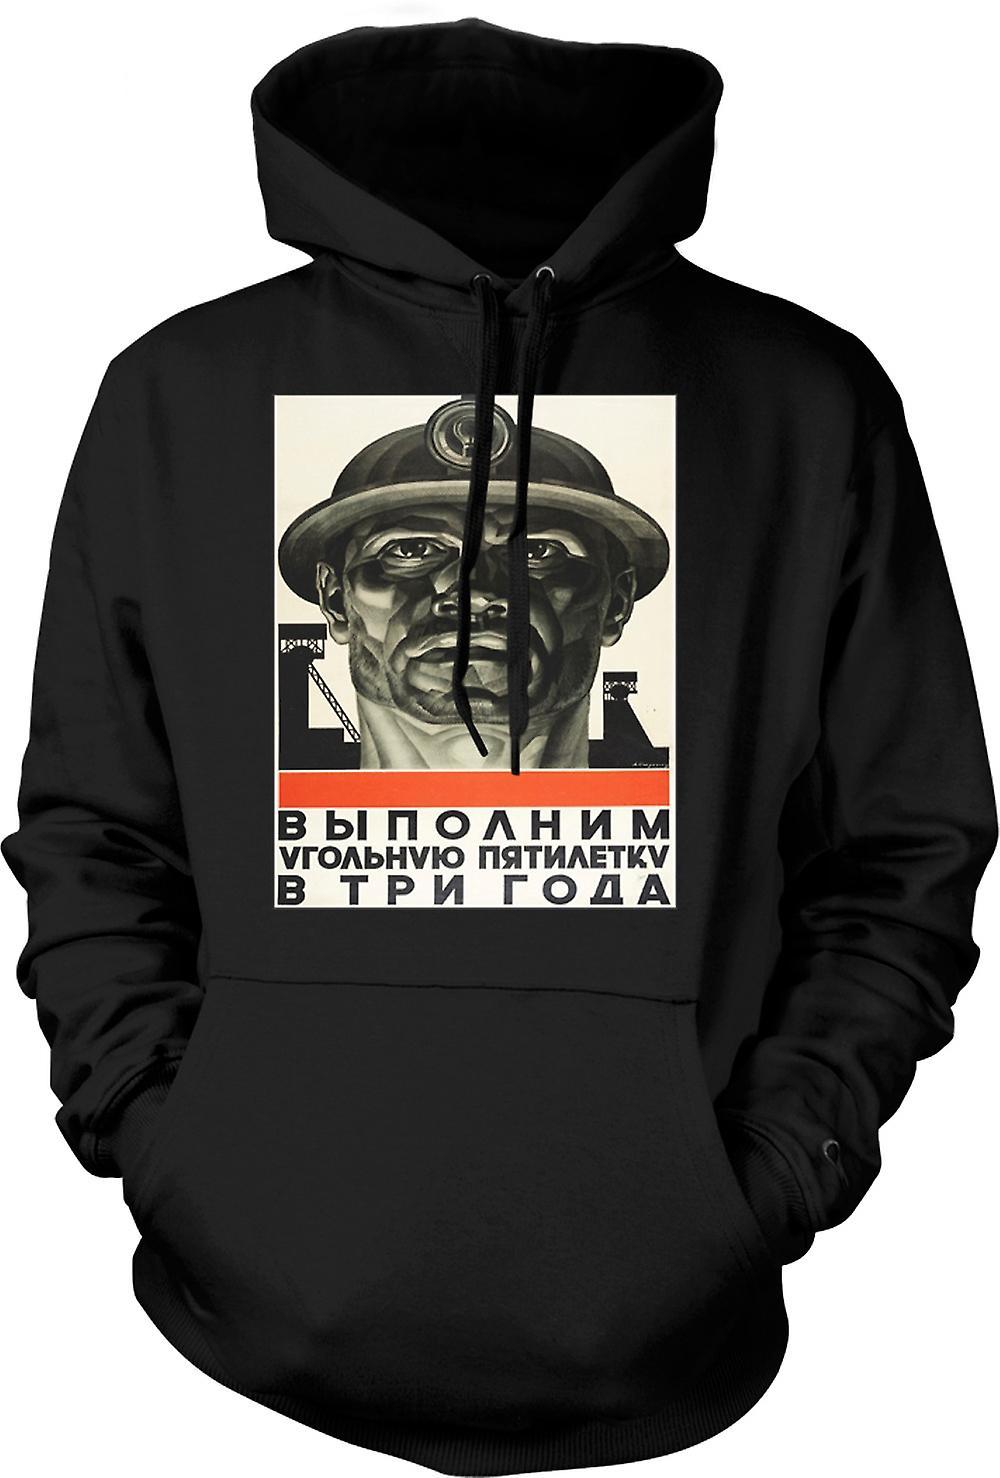 Mens Hoodie - Miner Russian Propoganda - Poster